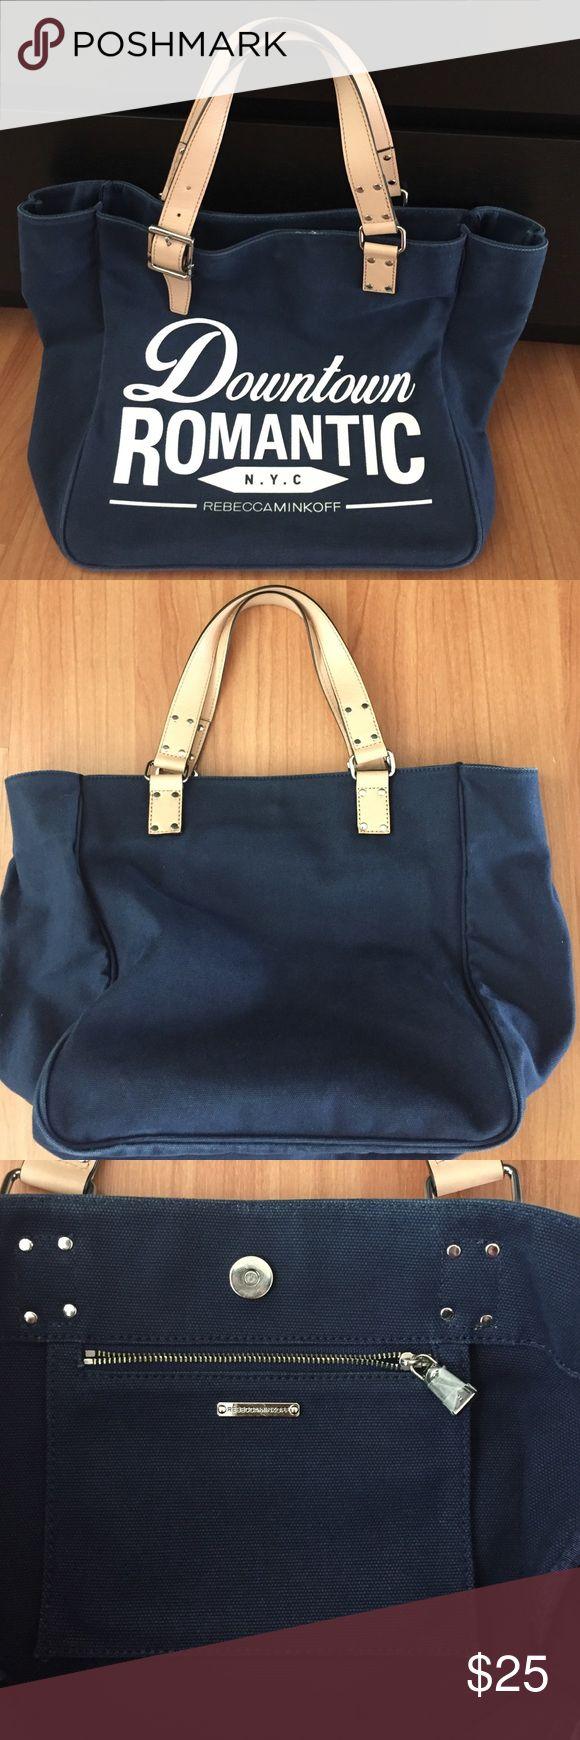 "Rebecca Monkoff navy shoulder bag Zip pocket inside 12"" x 12"" x 7"" Rebecca Minkoff Bags Shoulder Bags"